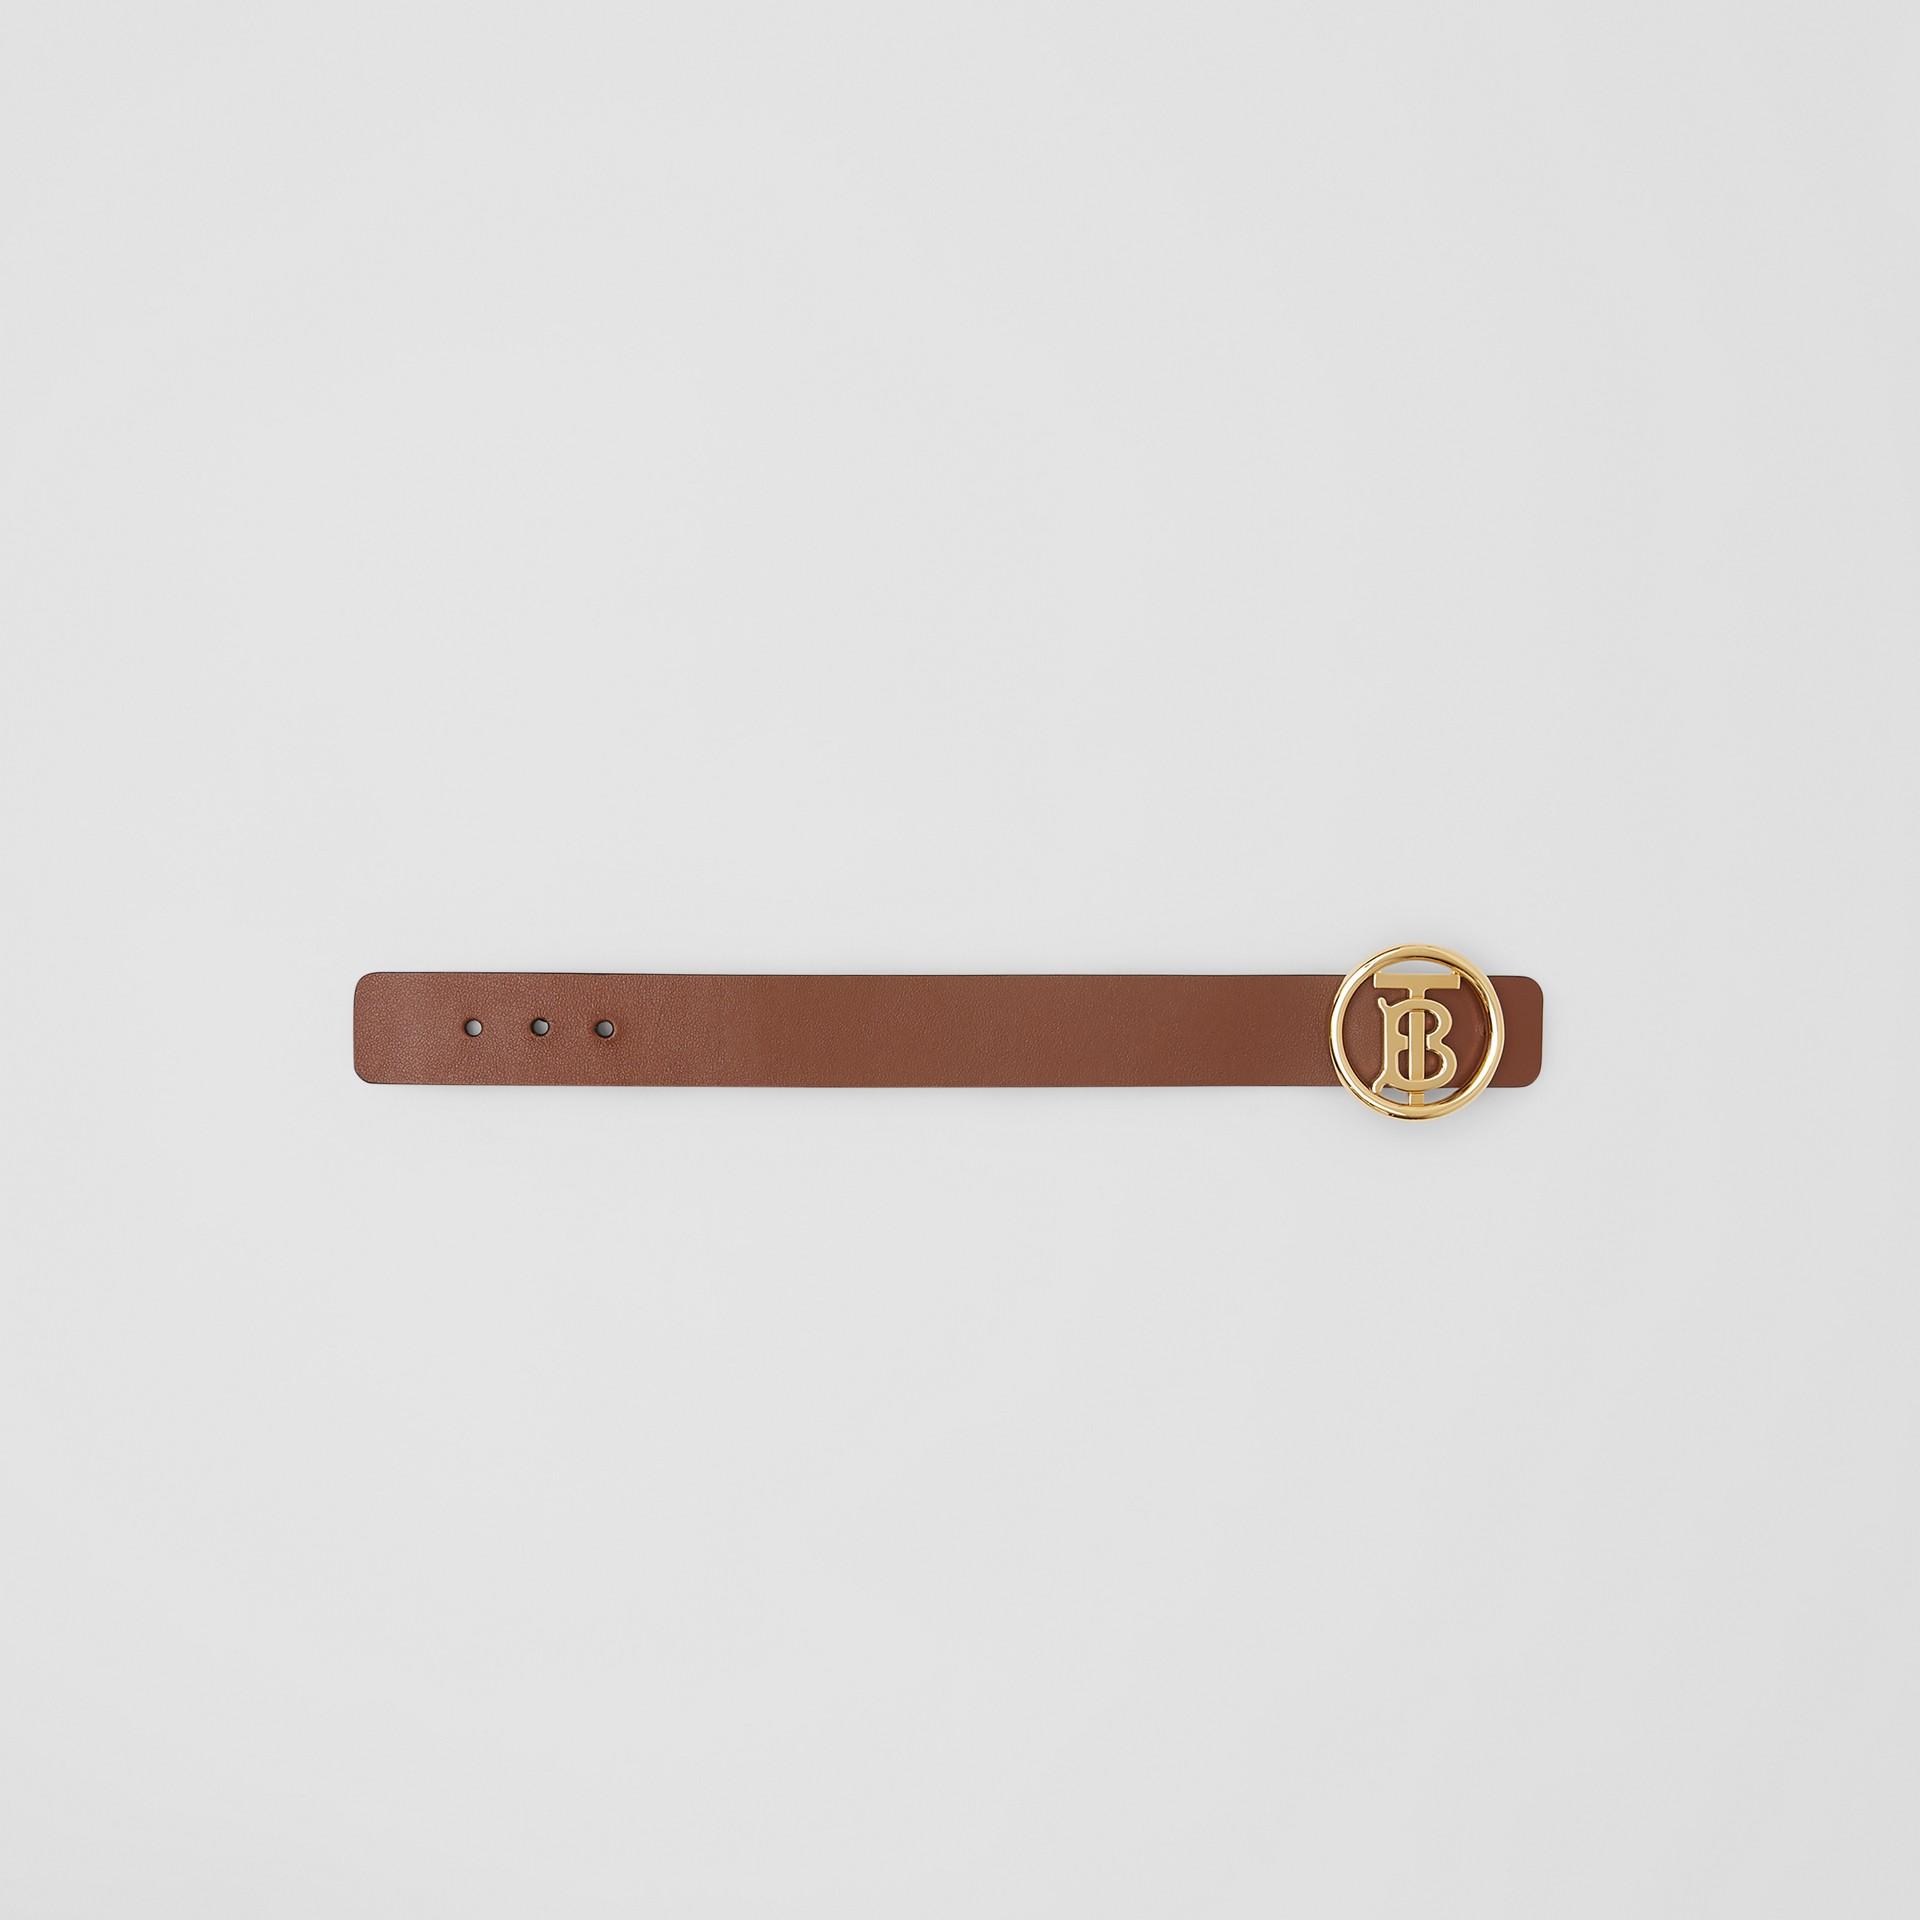 Monogram Motif Leather Bracelet in Tan - Women | Burberry - gallery image 3